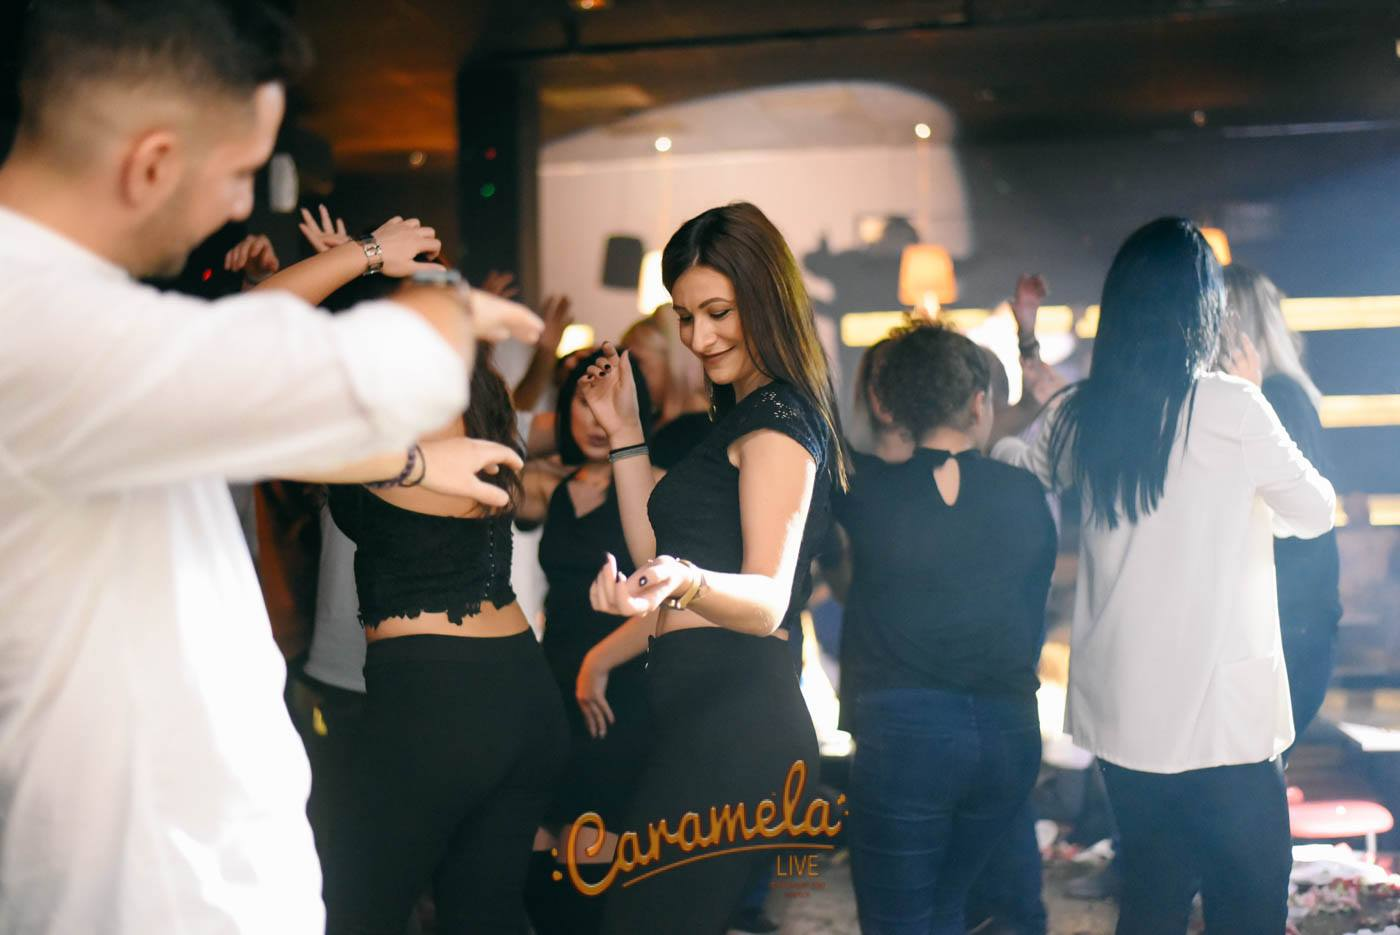 c2 2 - Ότι καλύτερο είδαμε στο Caramela Live! (Σάββατο 4 Νοεμβρίου)